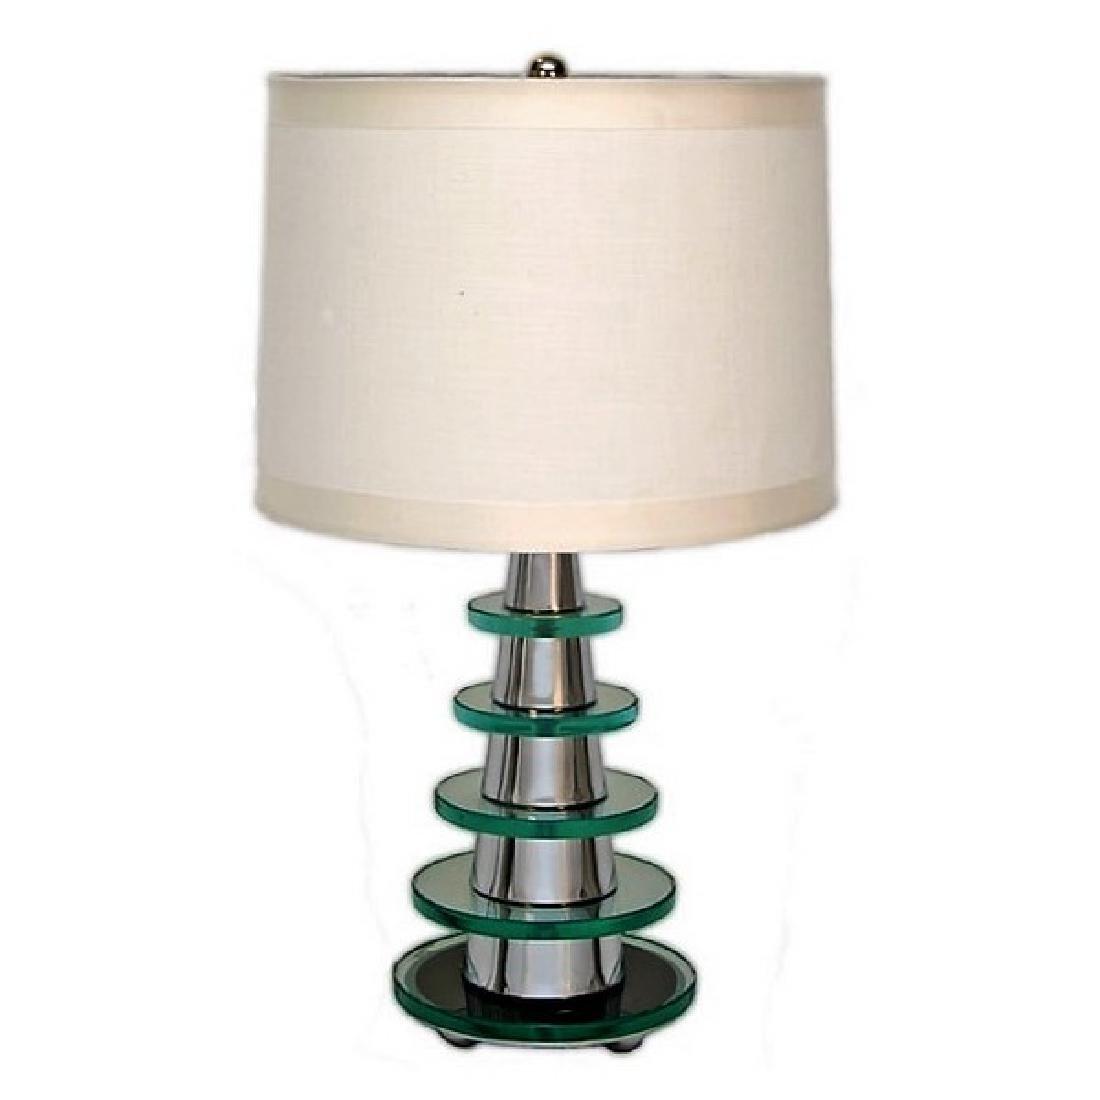 Modern Deco Glass Pyramid Table Lamp